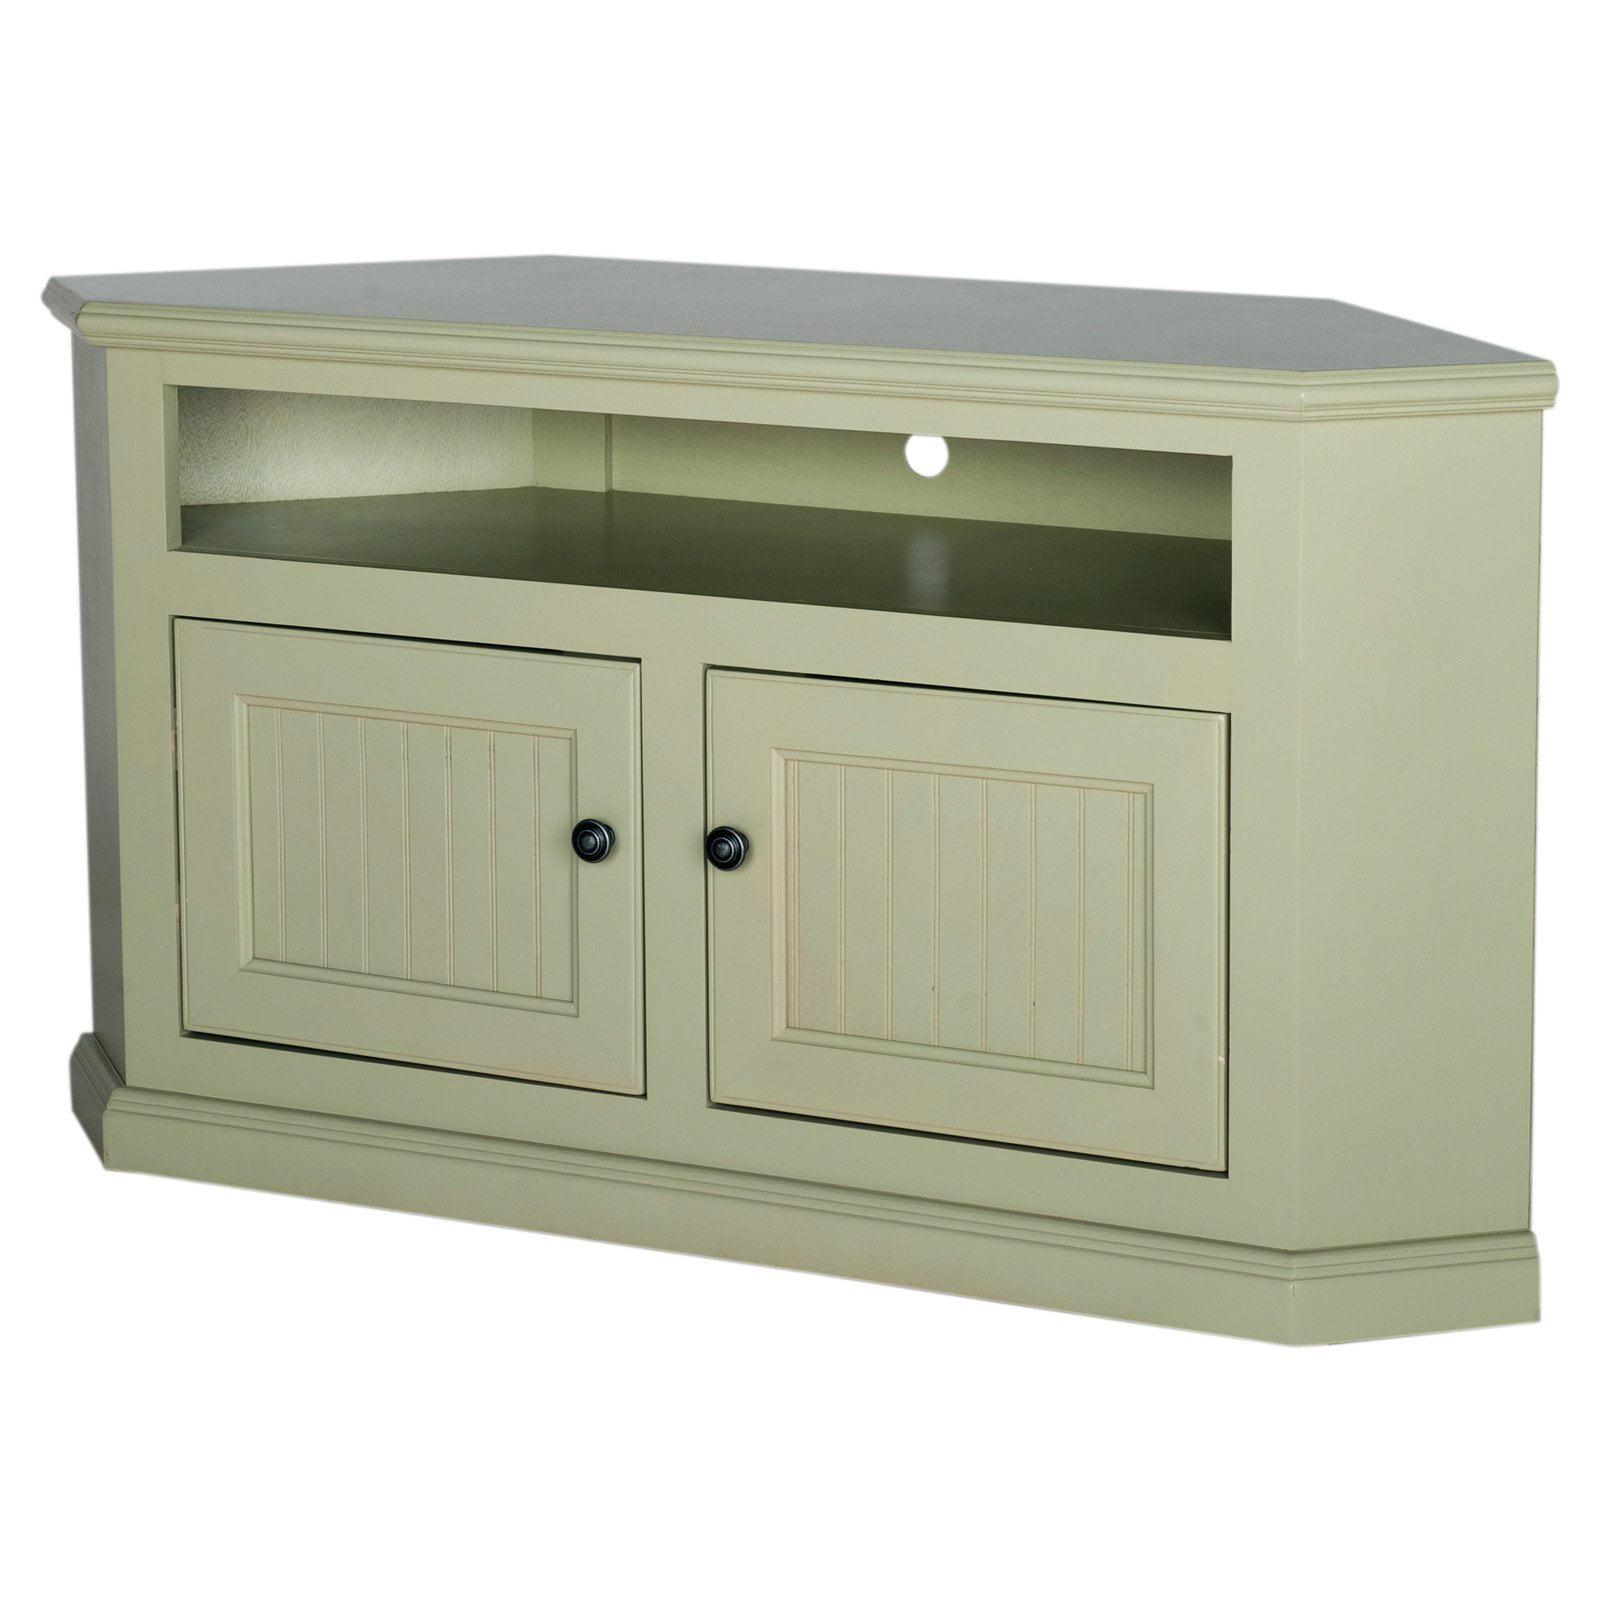 Eagle Furniture Coastal 40 in. Corner TV Stand